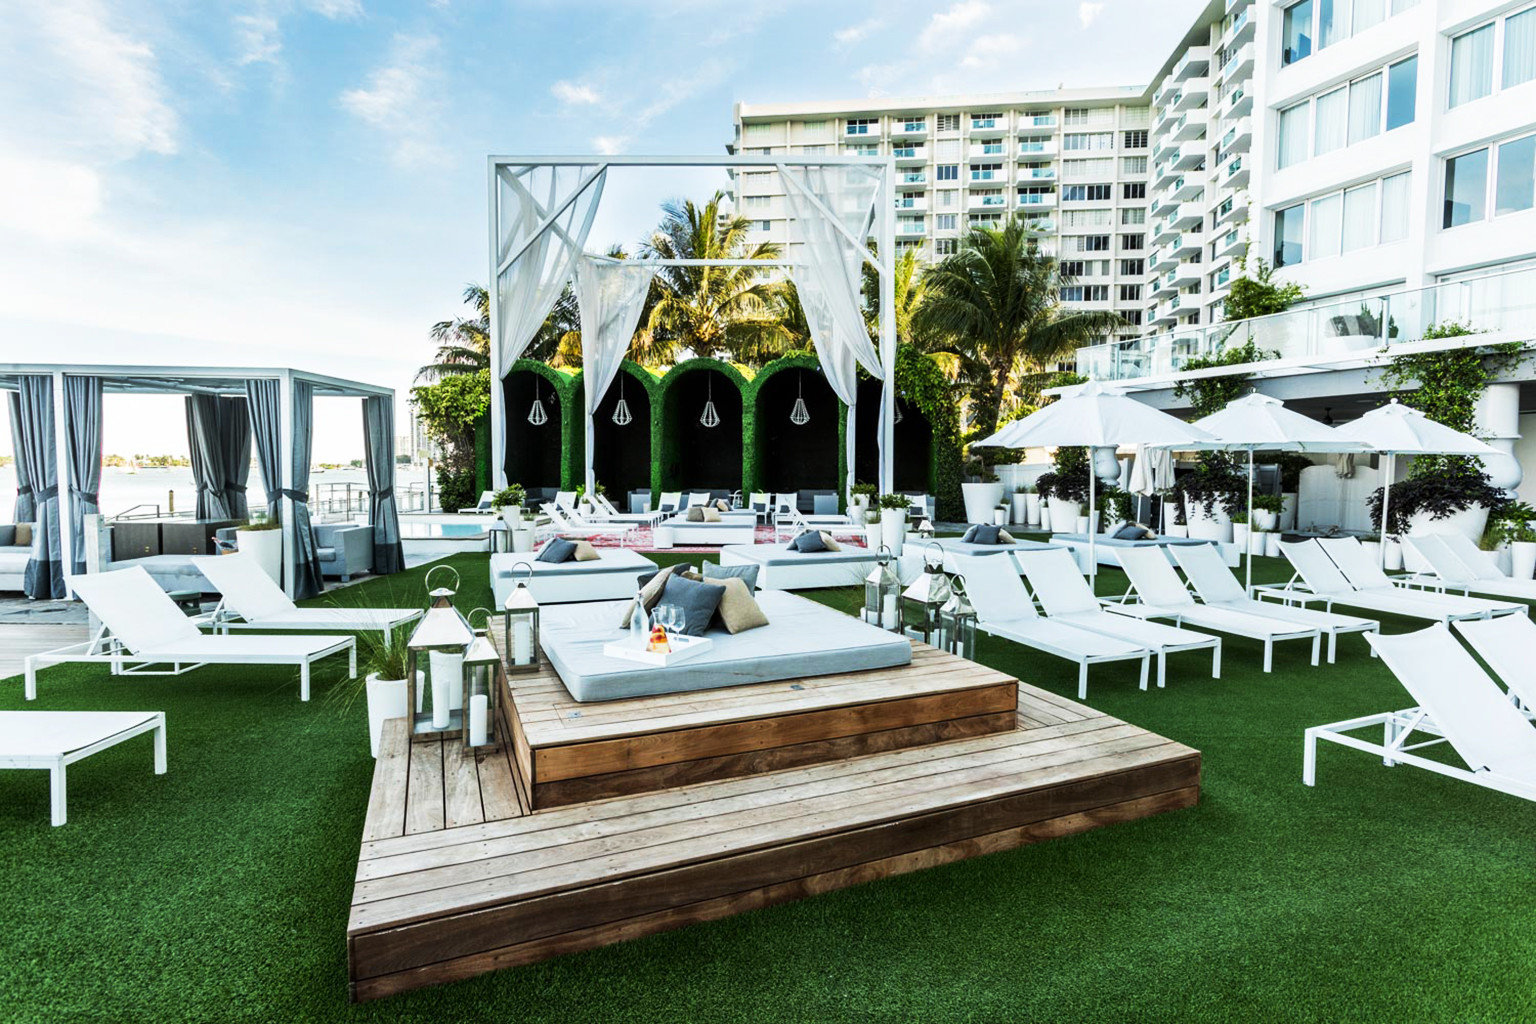 Drink Garden Lounge Resort Rooftop grass leisure property house condominium home mansion Villa swimming pool outdoor structure backyard dock Deck